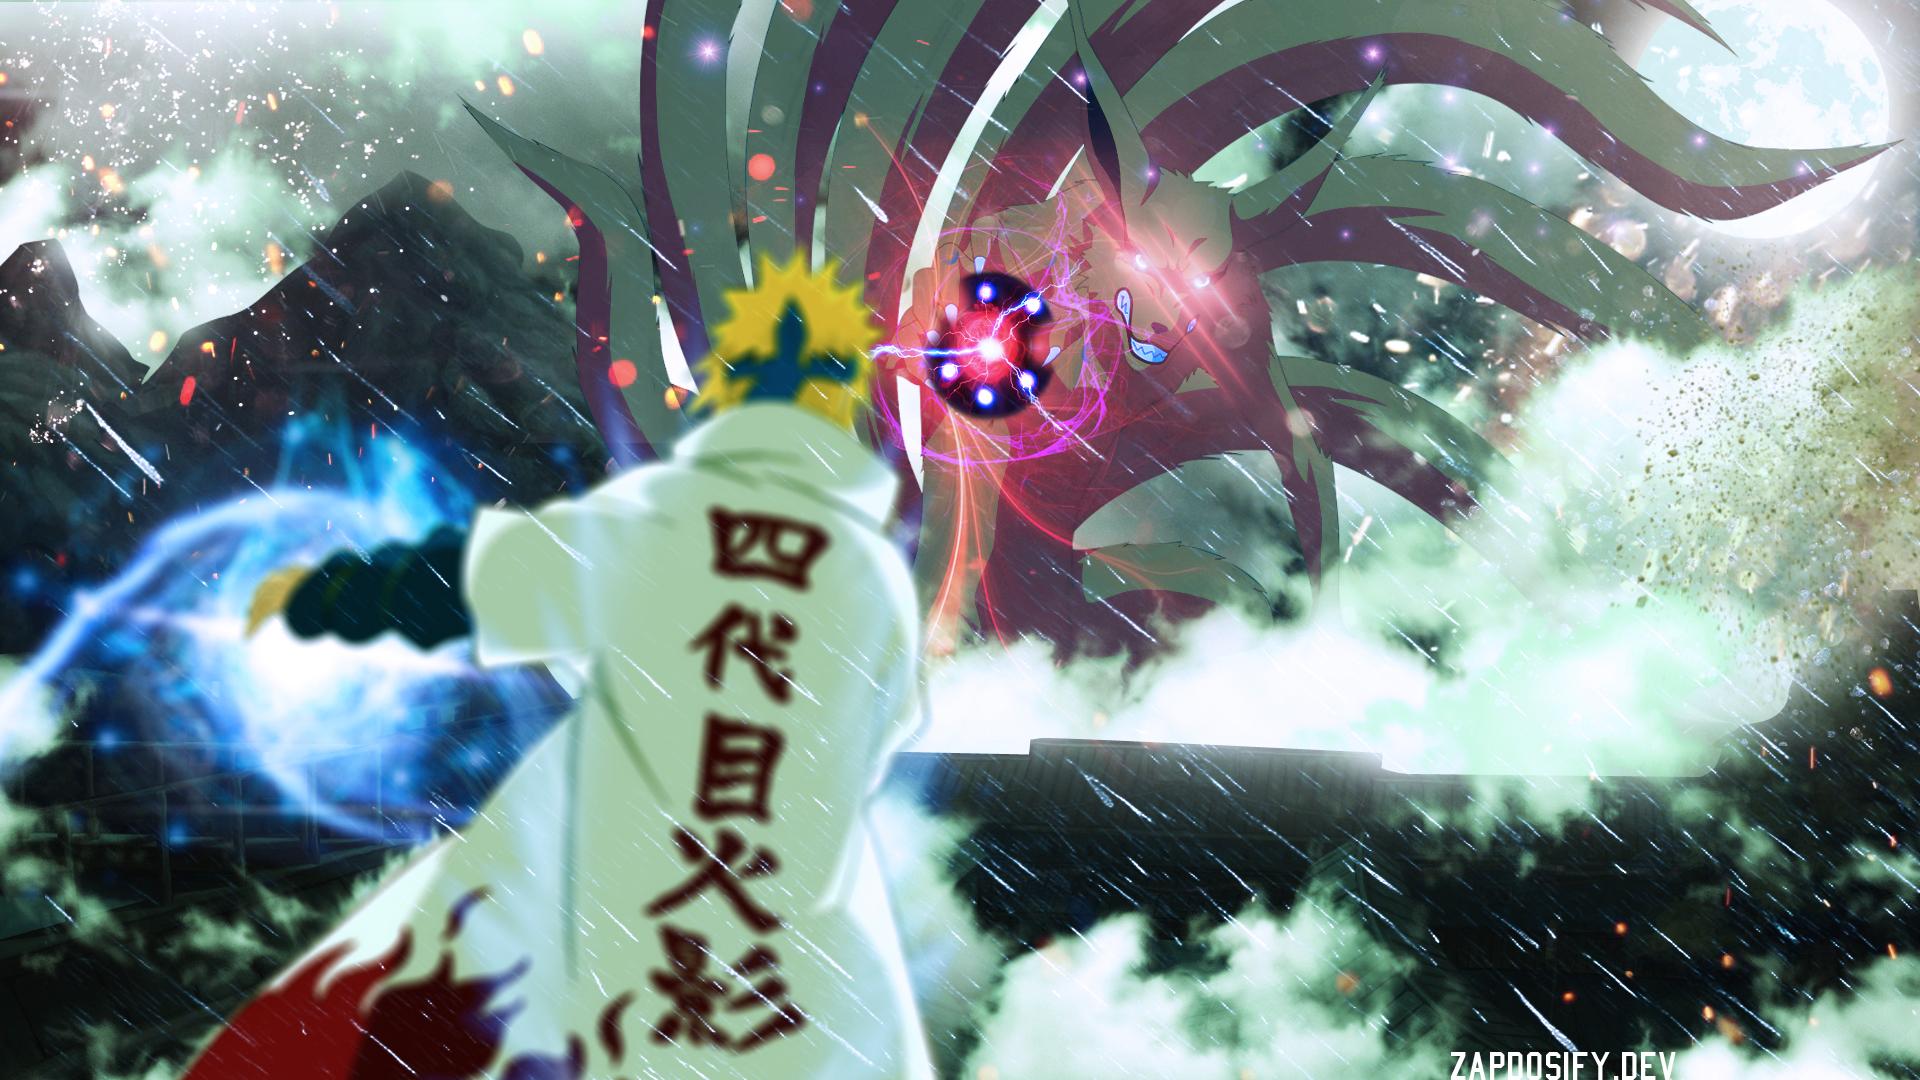 Naruto Hd Wallpaper Background Image 1920x1080 Id 710905